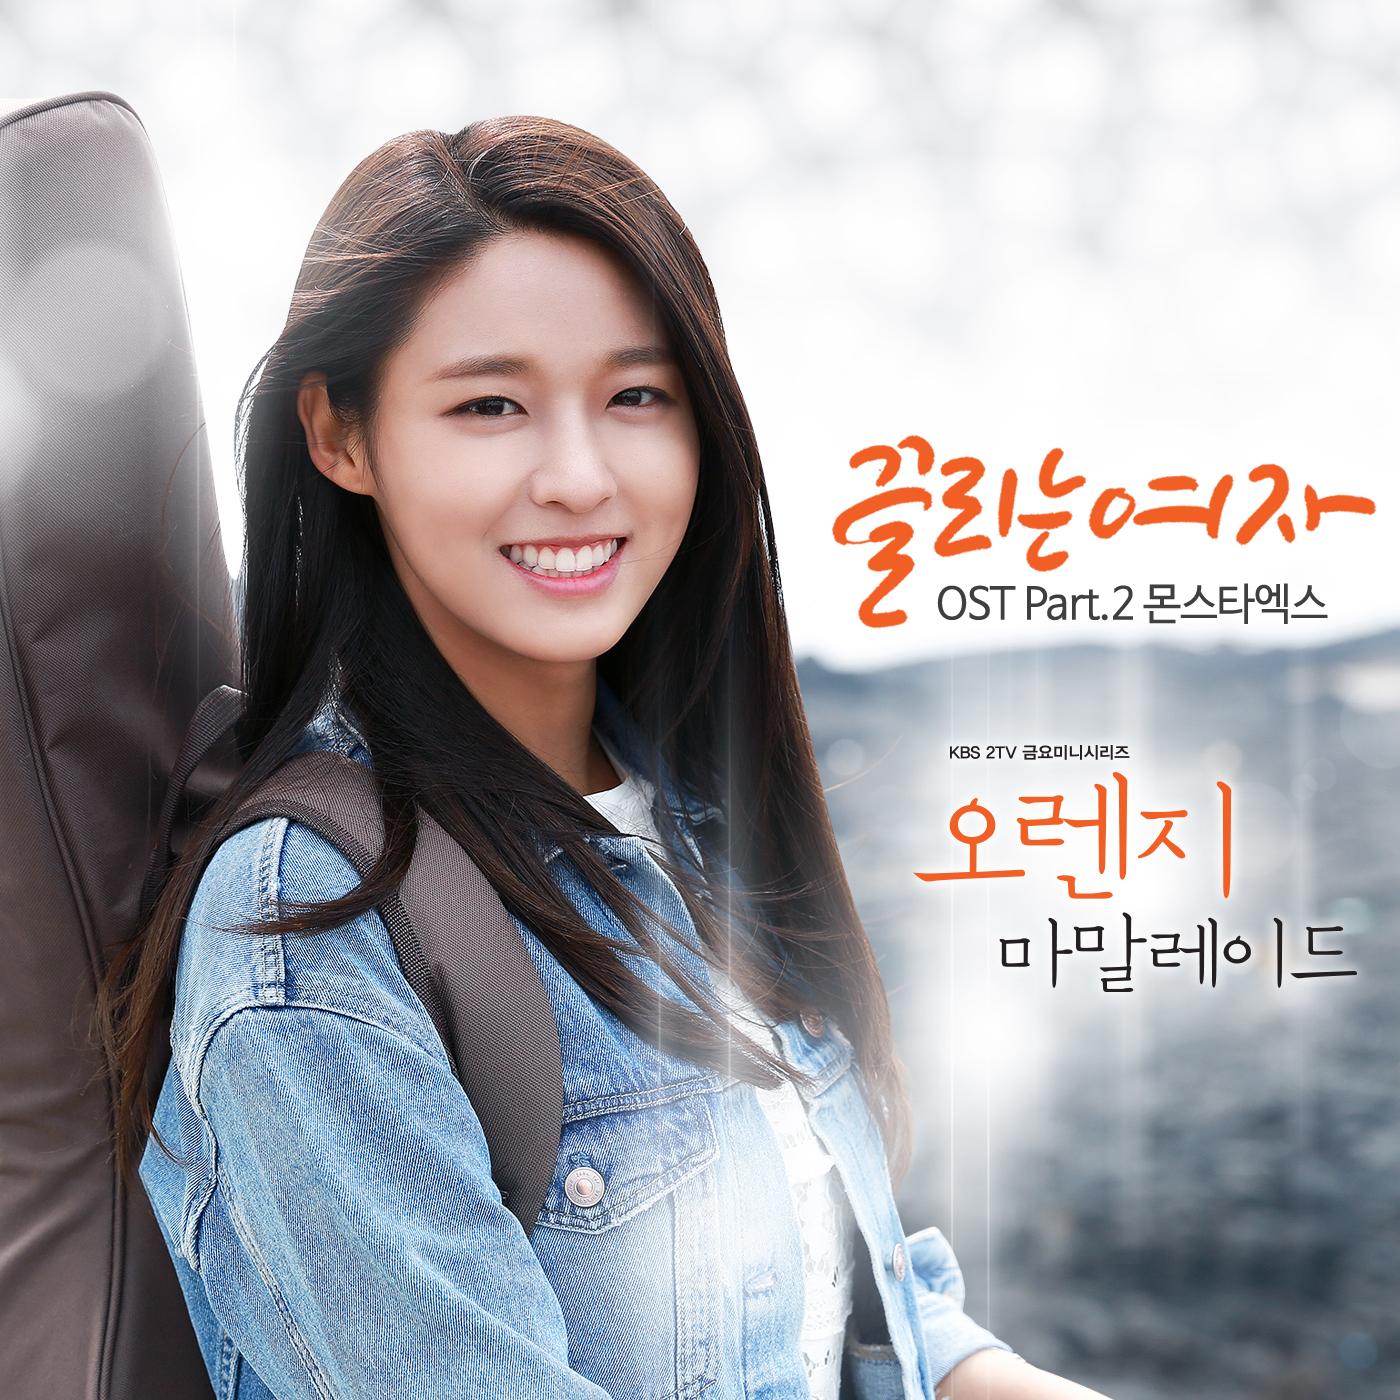 MONSTA X (Kihyun & Jooheon) - Attracted Women (Orange ...